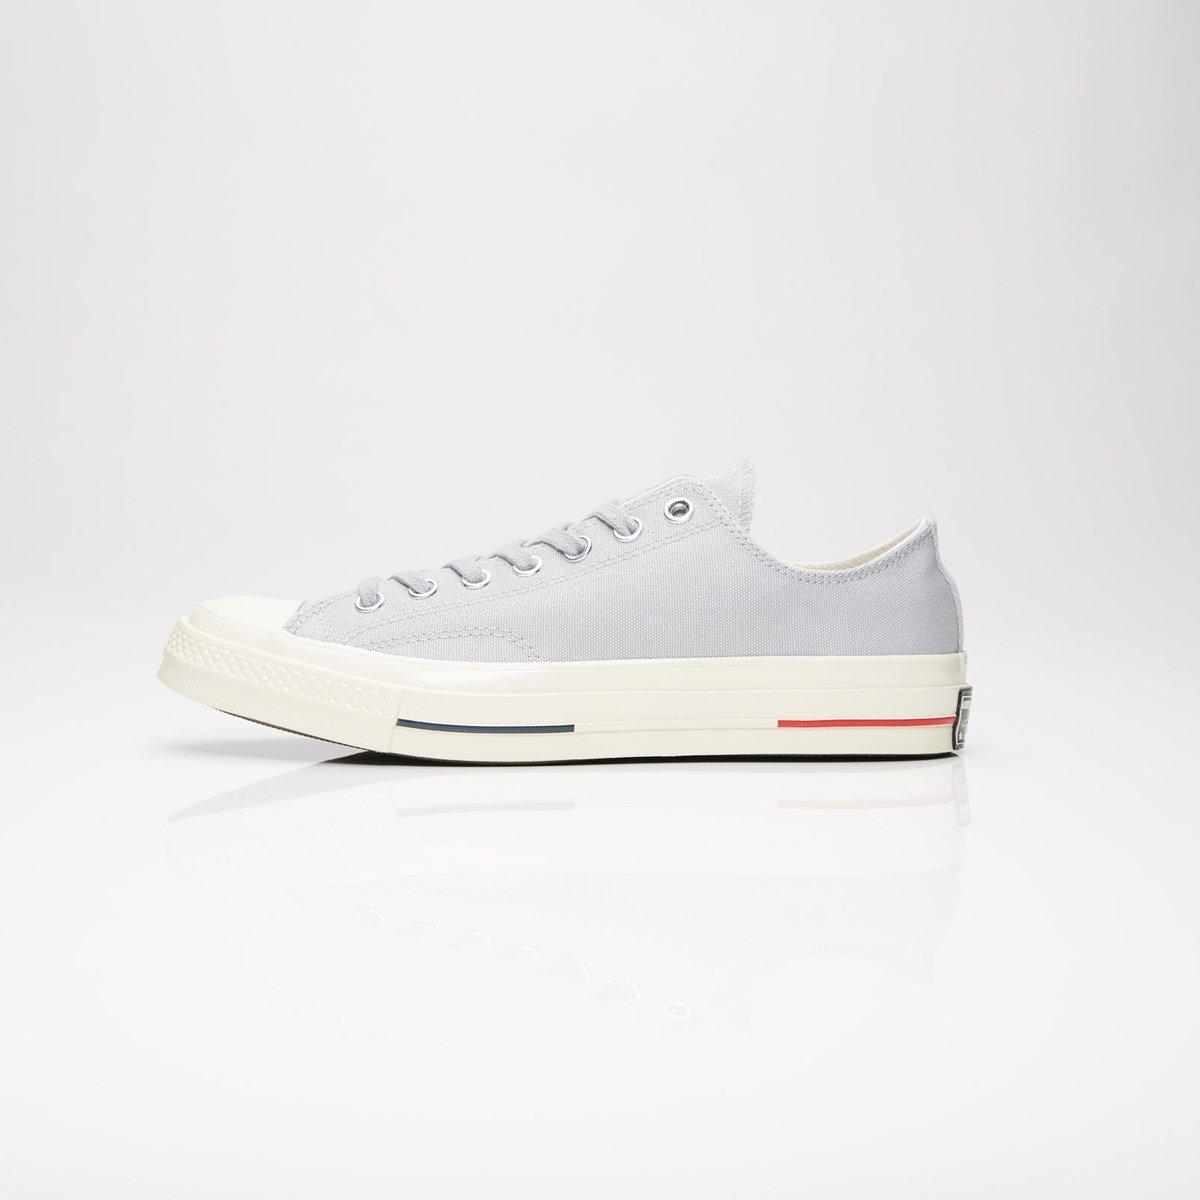 Converse Chuck 70 Ox 160496c Sneakersnstuff | sneakers